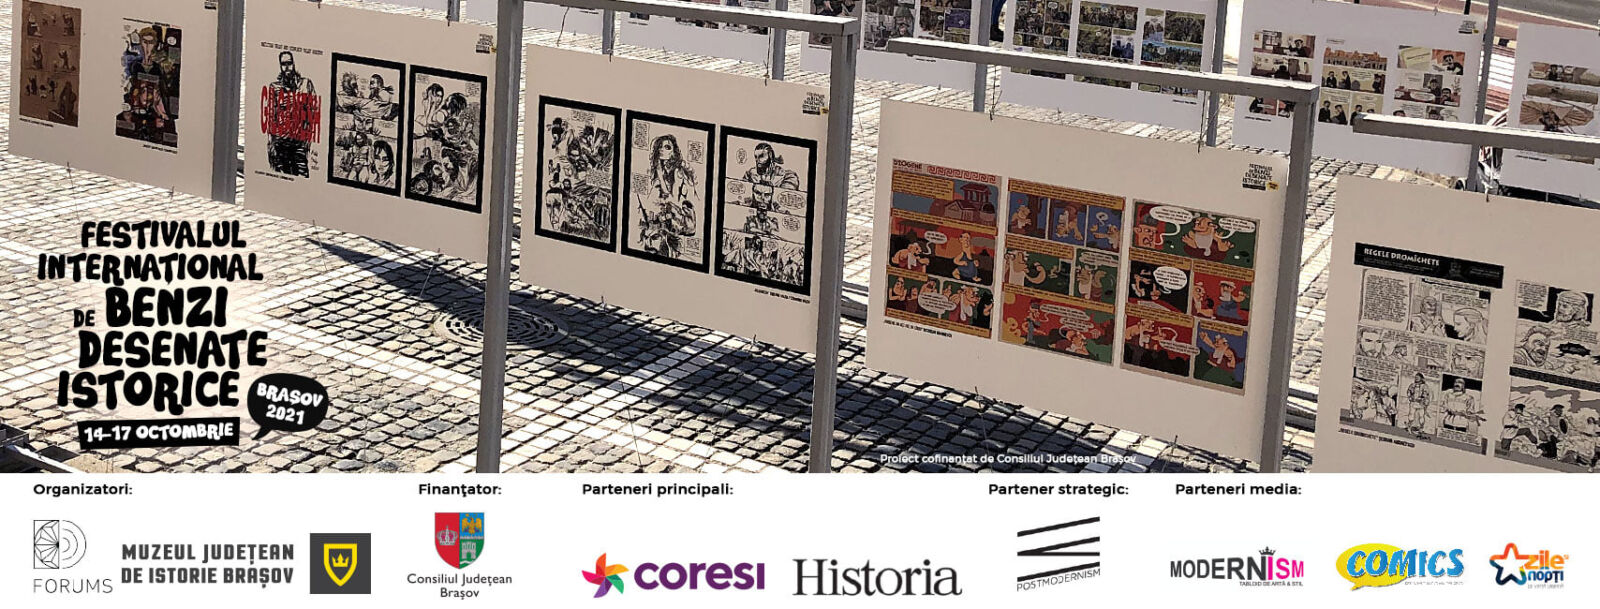 Festivalul de Benzi Desenate Istorice Brașov 2021